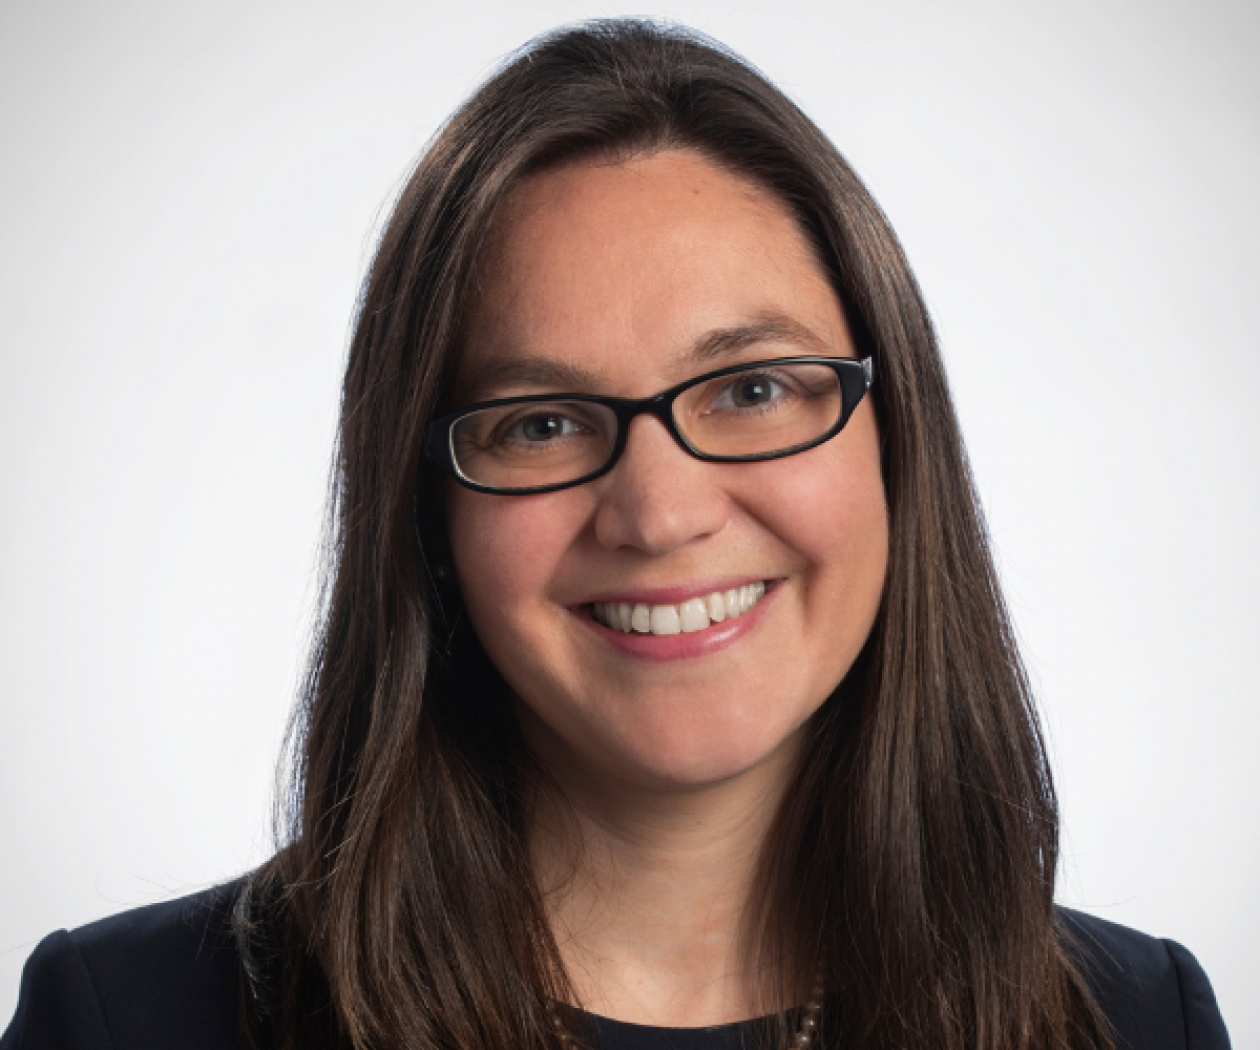 Dr. Stephanie Lheureux